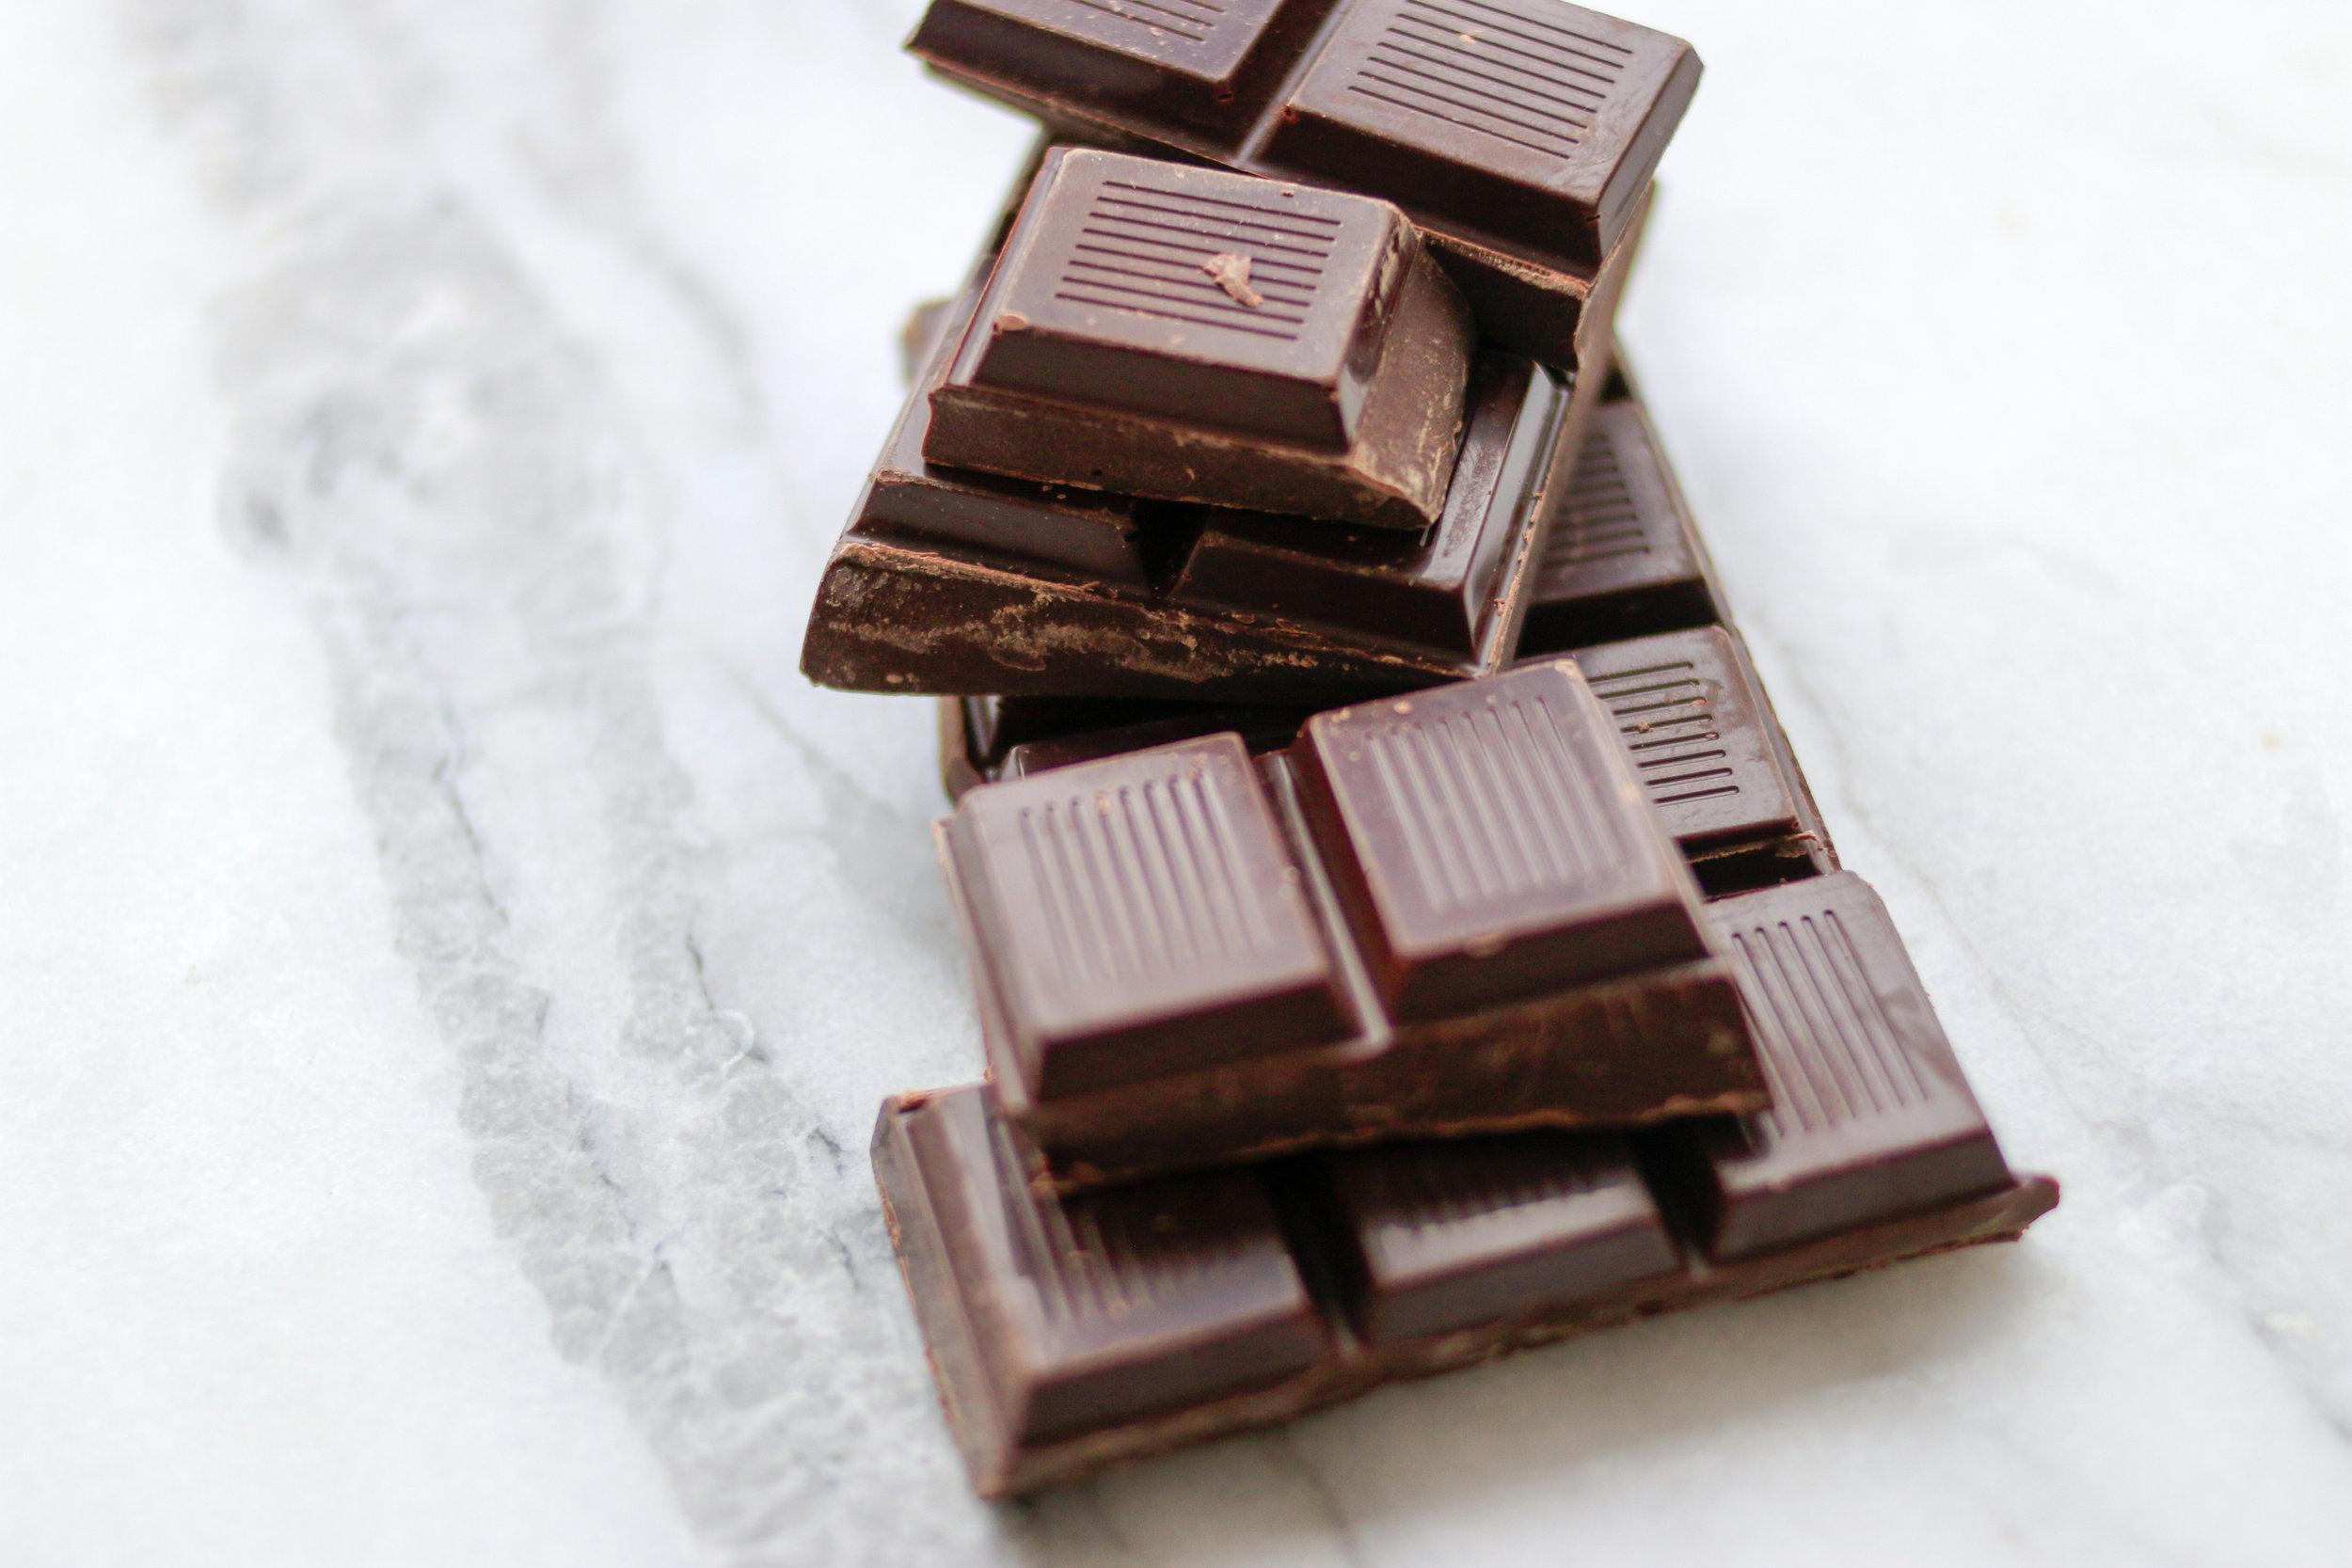 chocolate @rebeccaplotnick